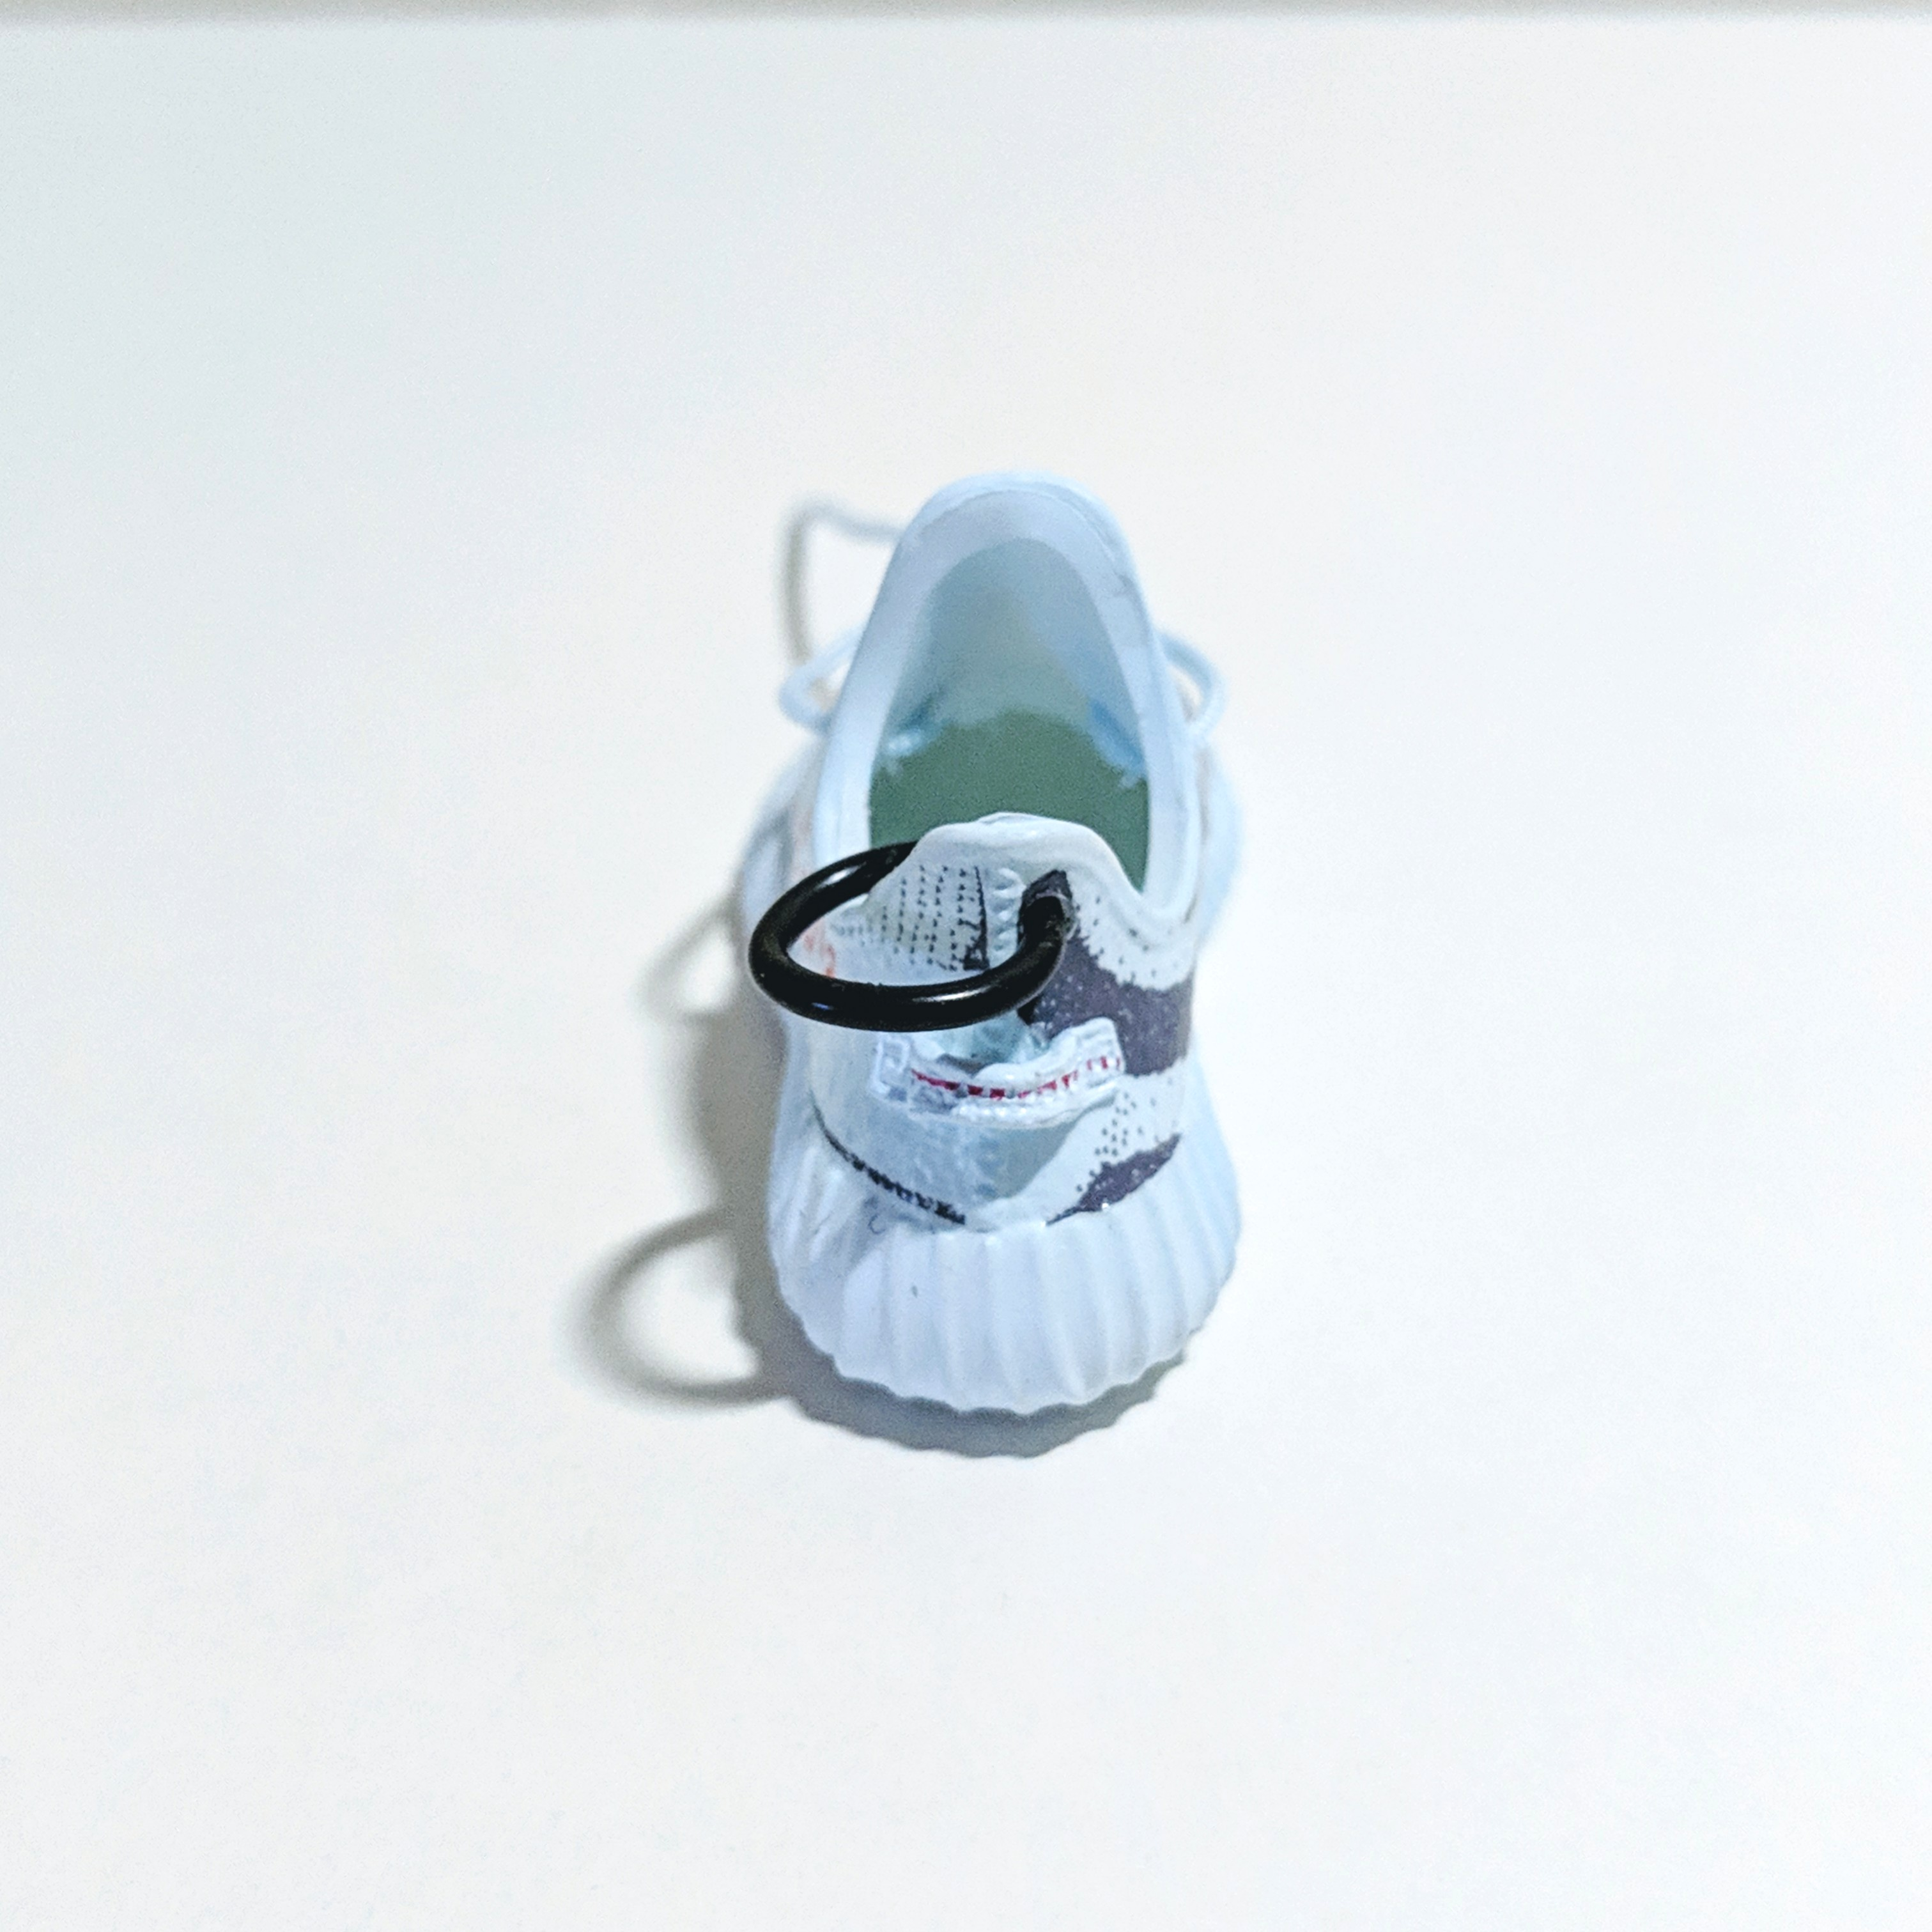 bd0ef19ef16ae Blue Tint Yeezy Boost Adidas shoe keychain set + Box + Paperbag ...